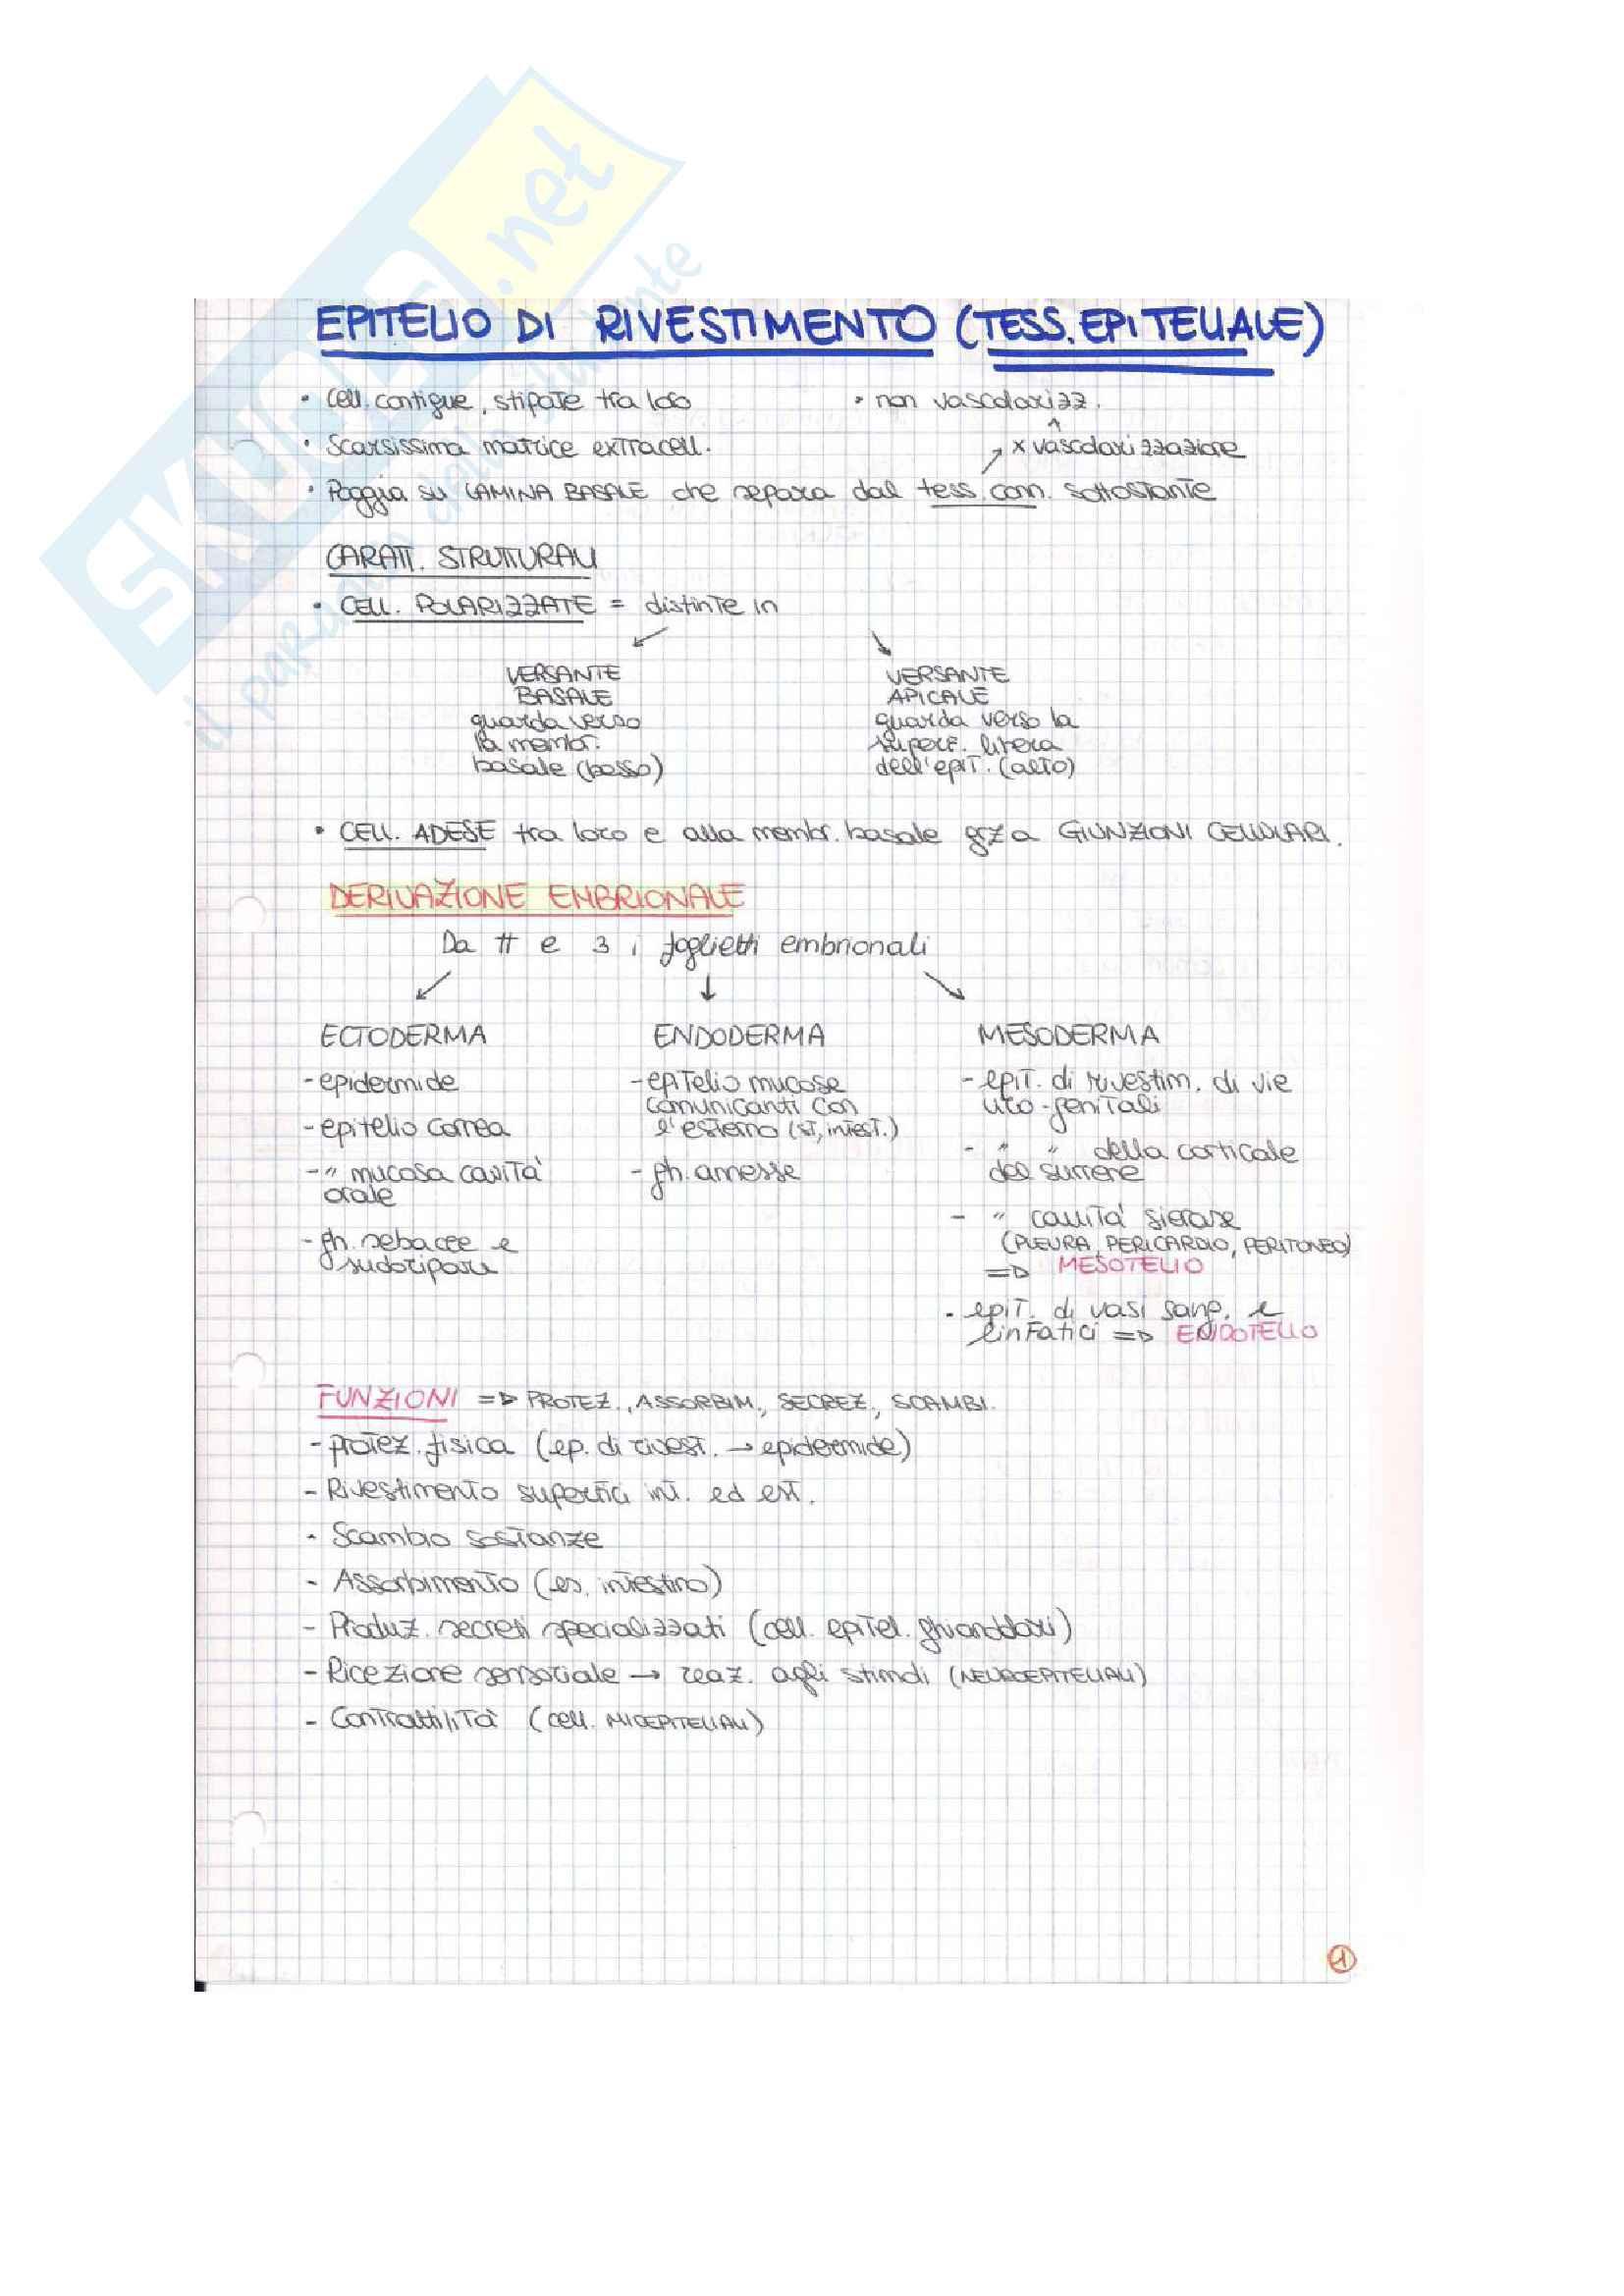 Istologia (esame istologia ed embriologia)